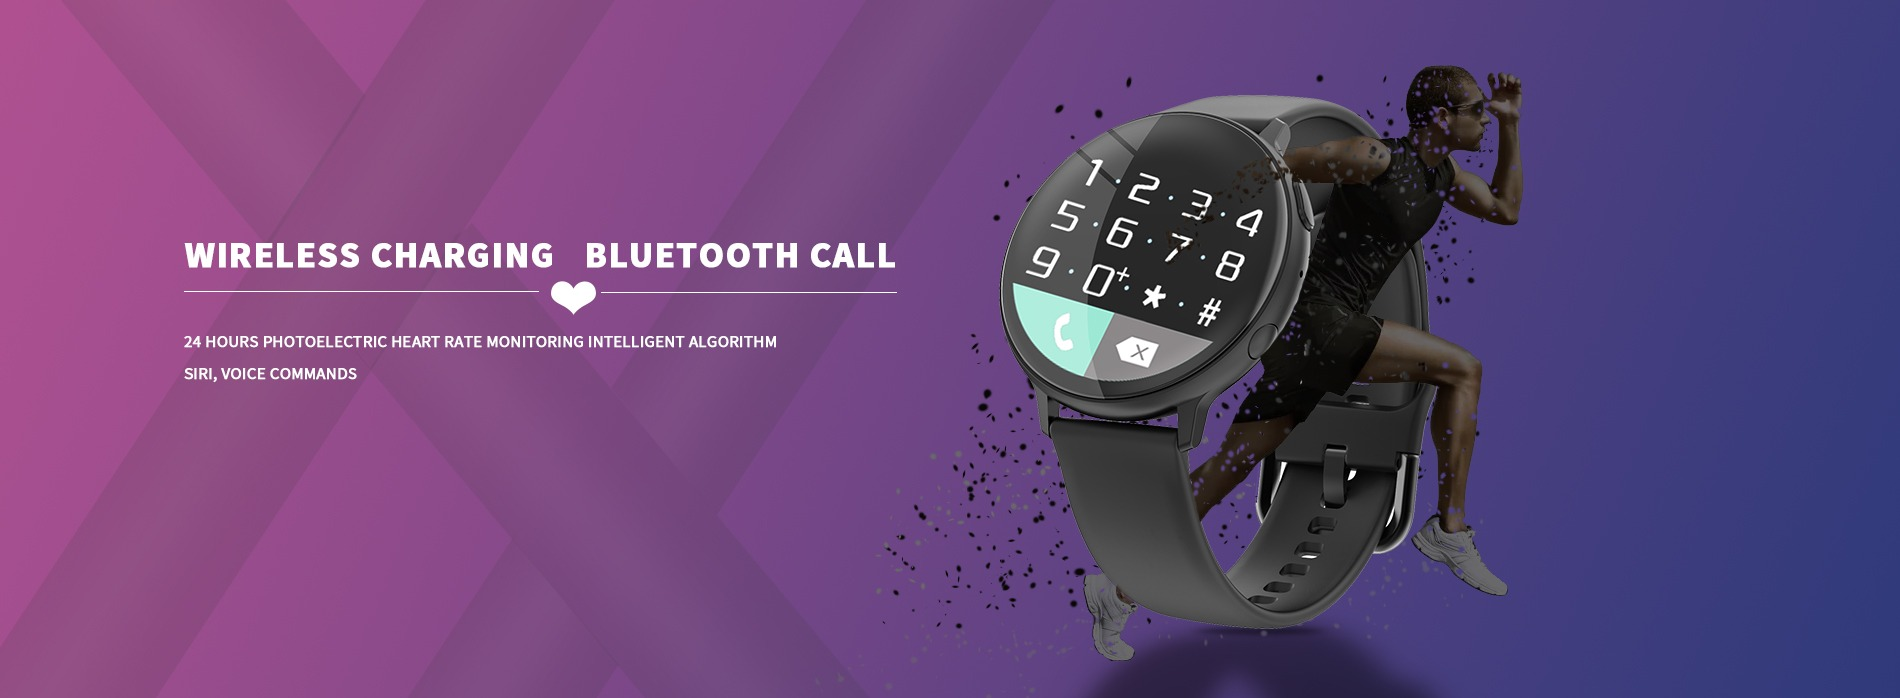 H914e410c57194324861bf3e77c7839f8B XUESEVEN 2021 HD Full circle touch screen Mens Smart Watches IP68 Waterproof Sports Fitness Watch Fashion Smart Watch for men